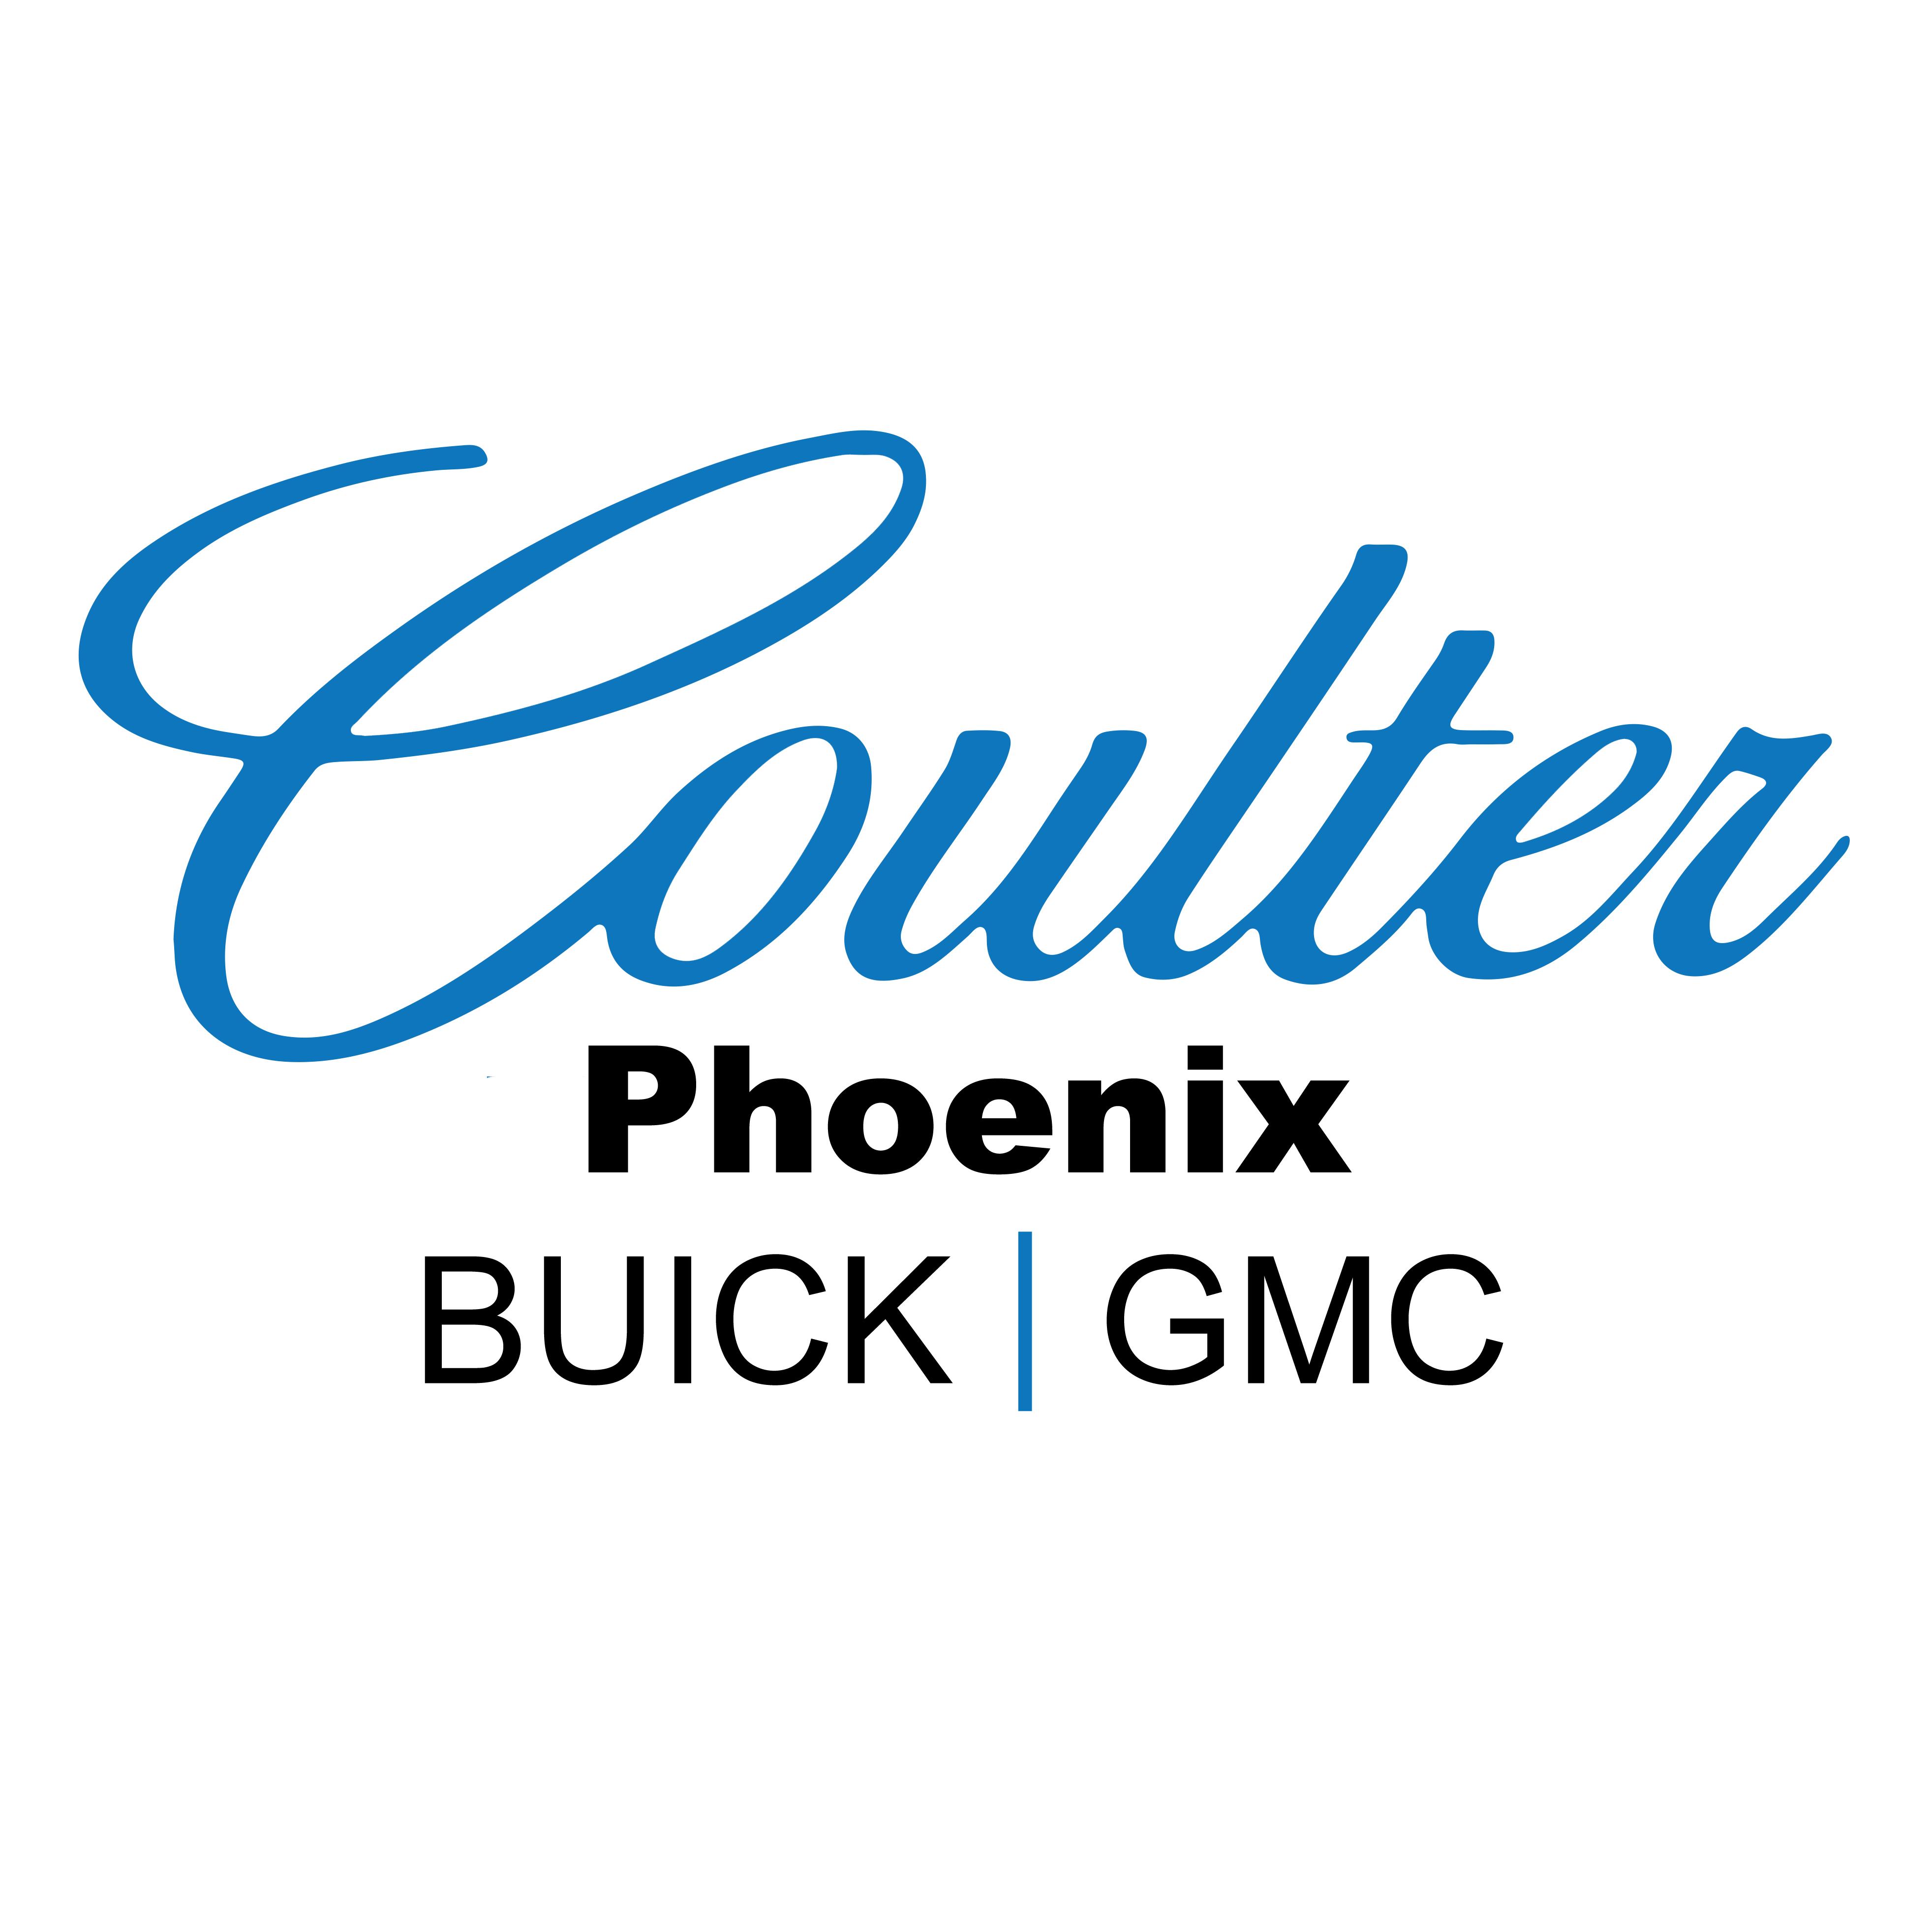 Coulter Buick GMC Phoenix